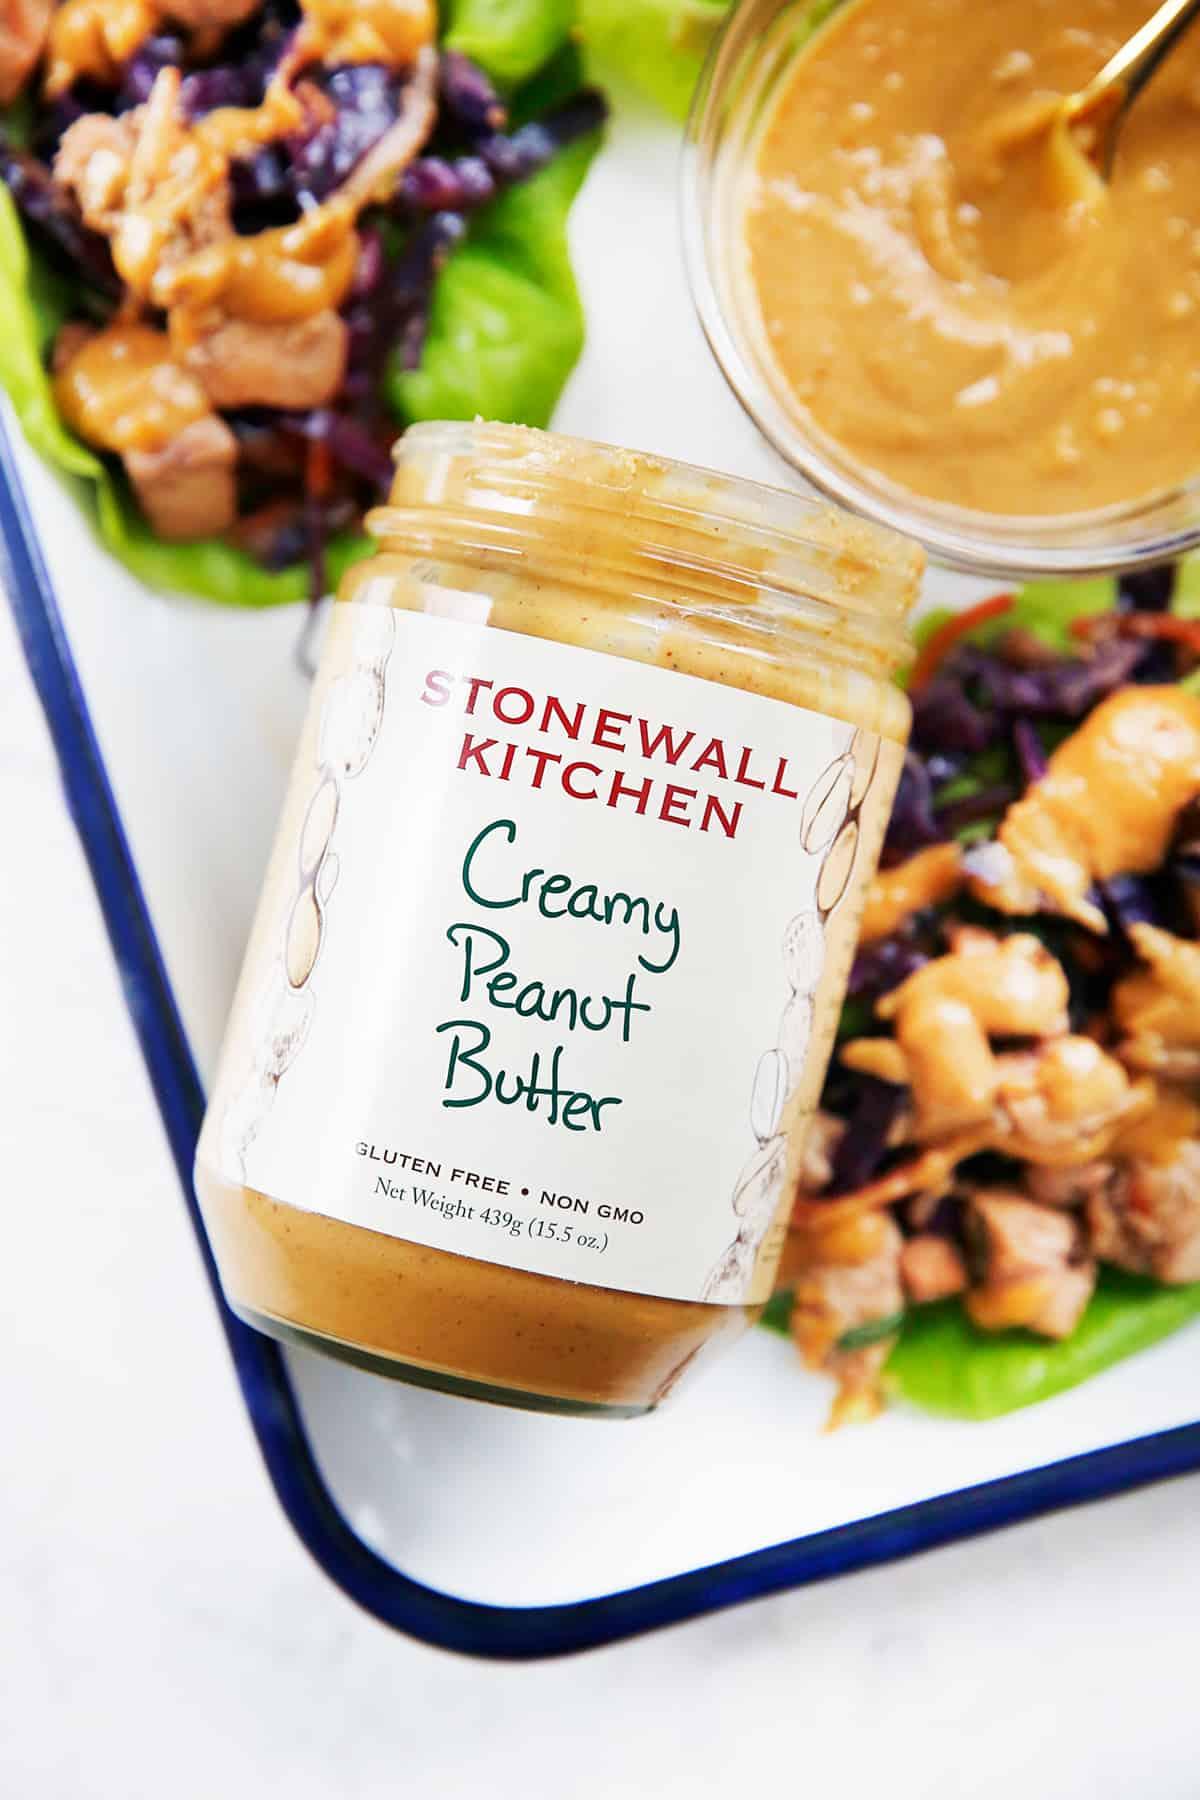 Stonewall Kitchen Peanut Butter